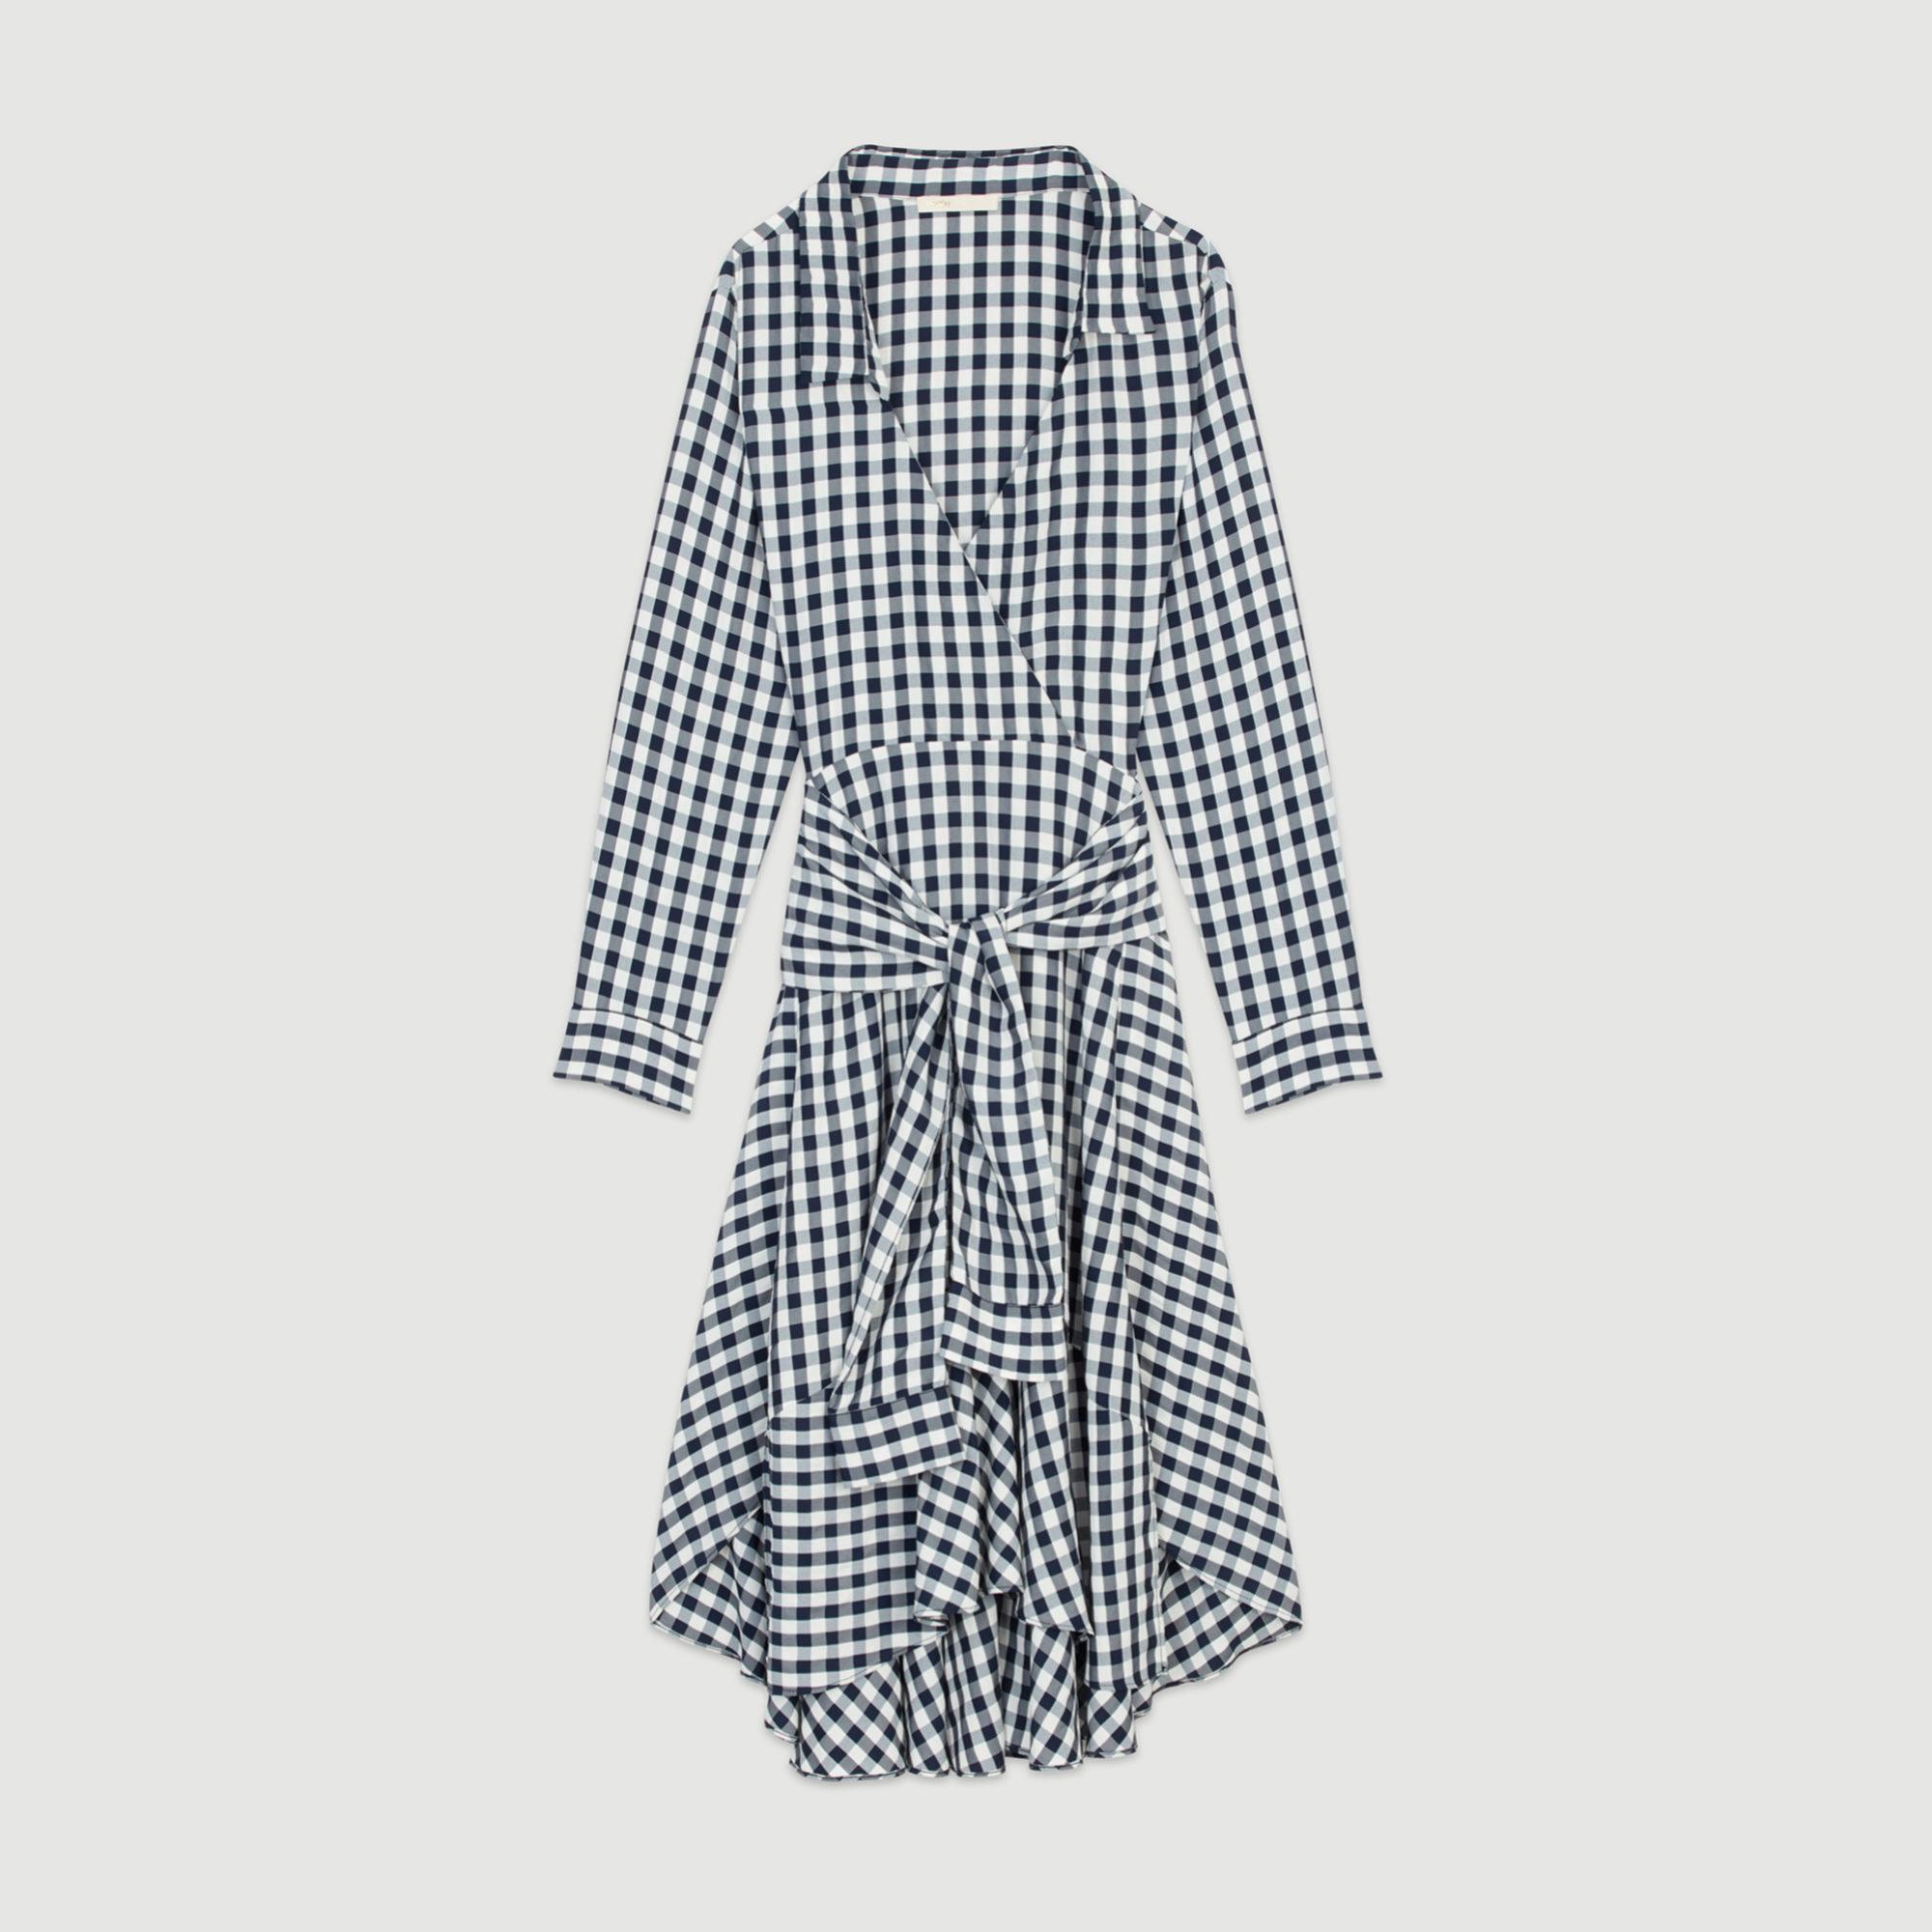 Vestido camisero de Maje (137,50¤)